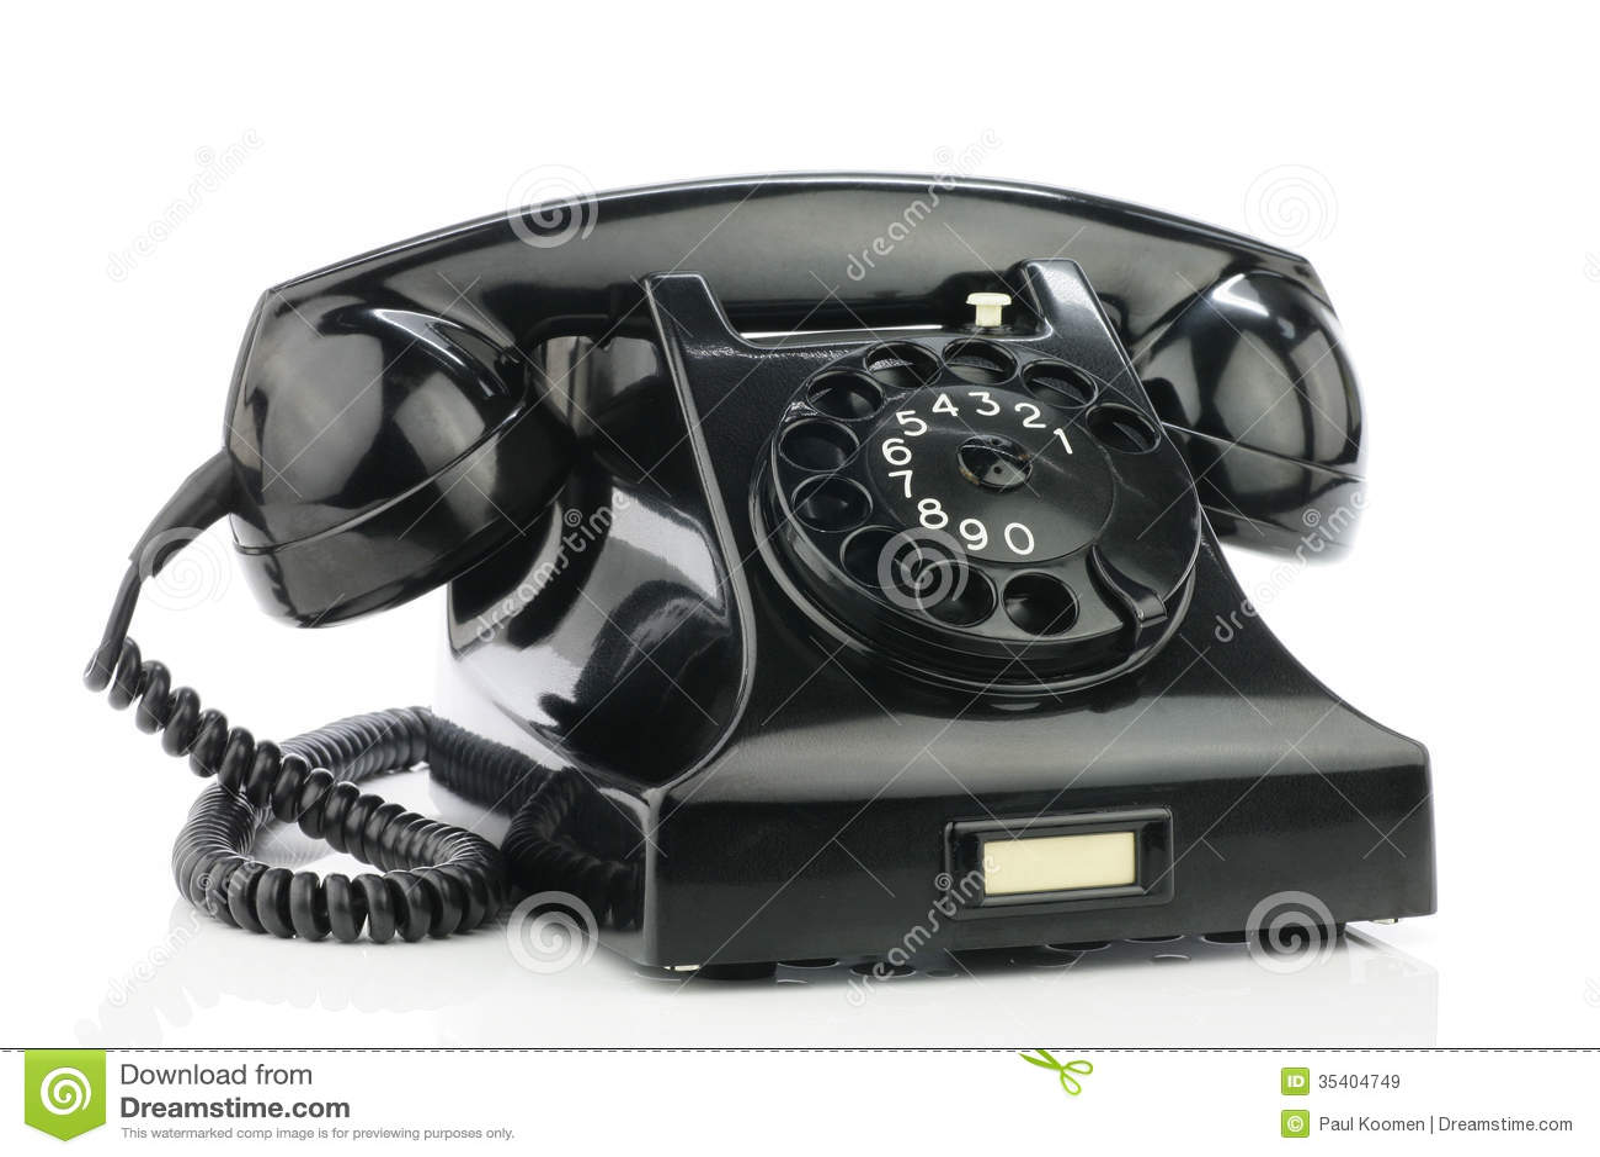 Telephone 1950 Bakelite Phone Royalty Free